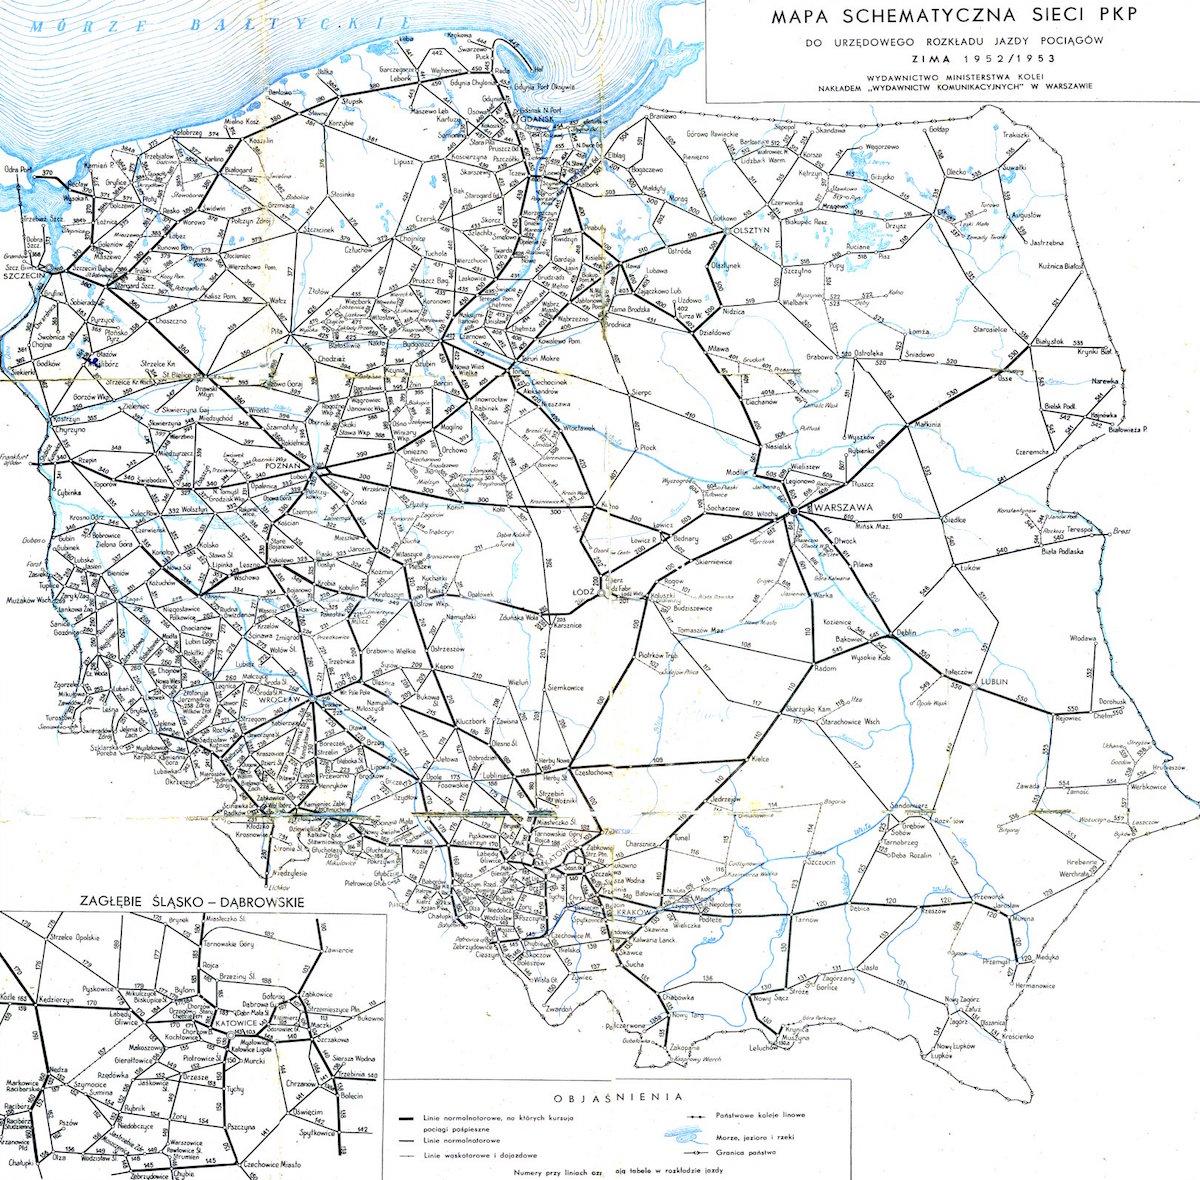 stan map with 10 Fascynujacych Historycznych Map Polski on Auto Train Gallery Jackowski further 0066073 moreover 29562454872 also Hotel Map additionally Iron Man Armor MK V  Earth 199999.